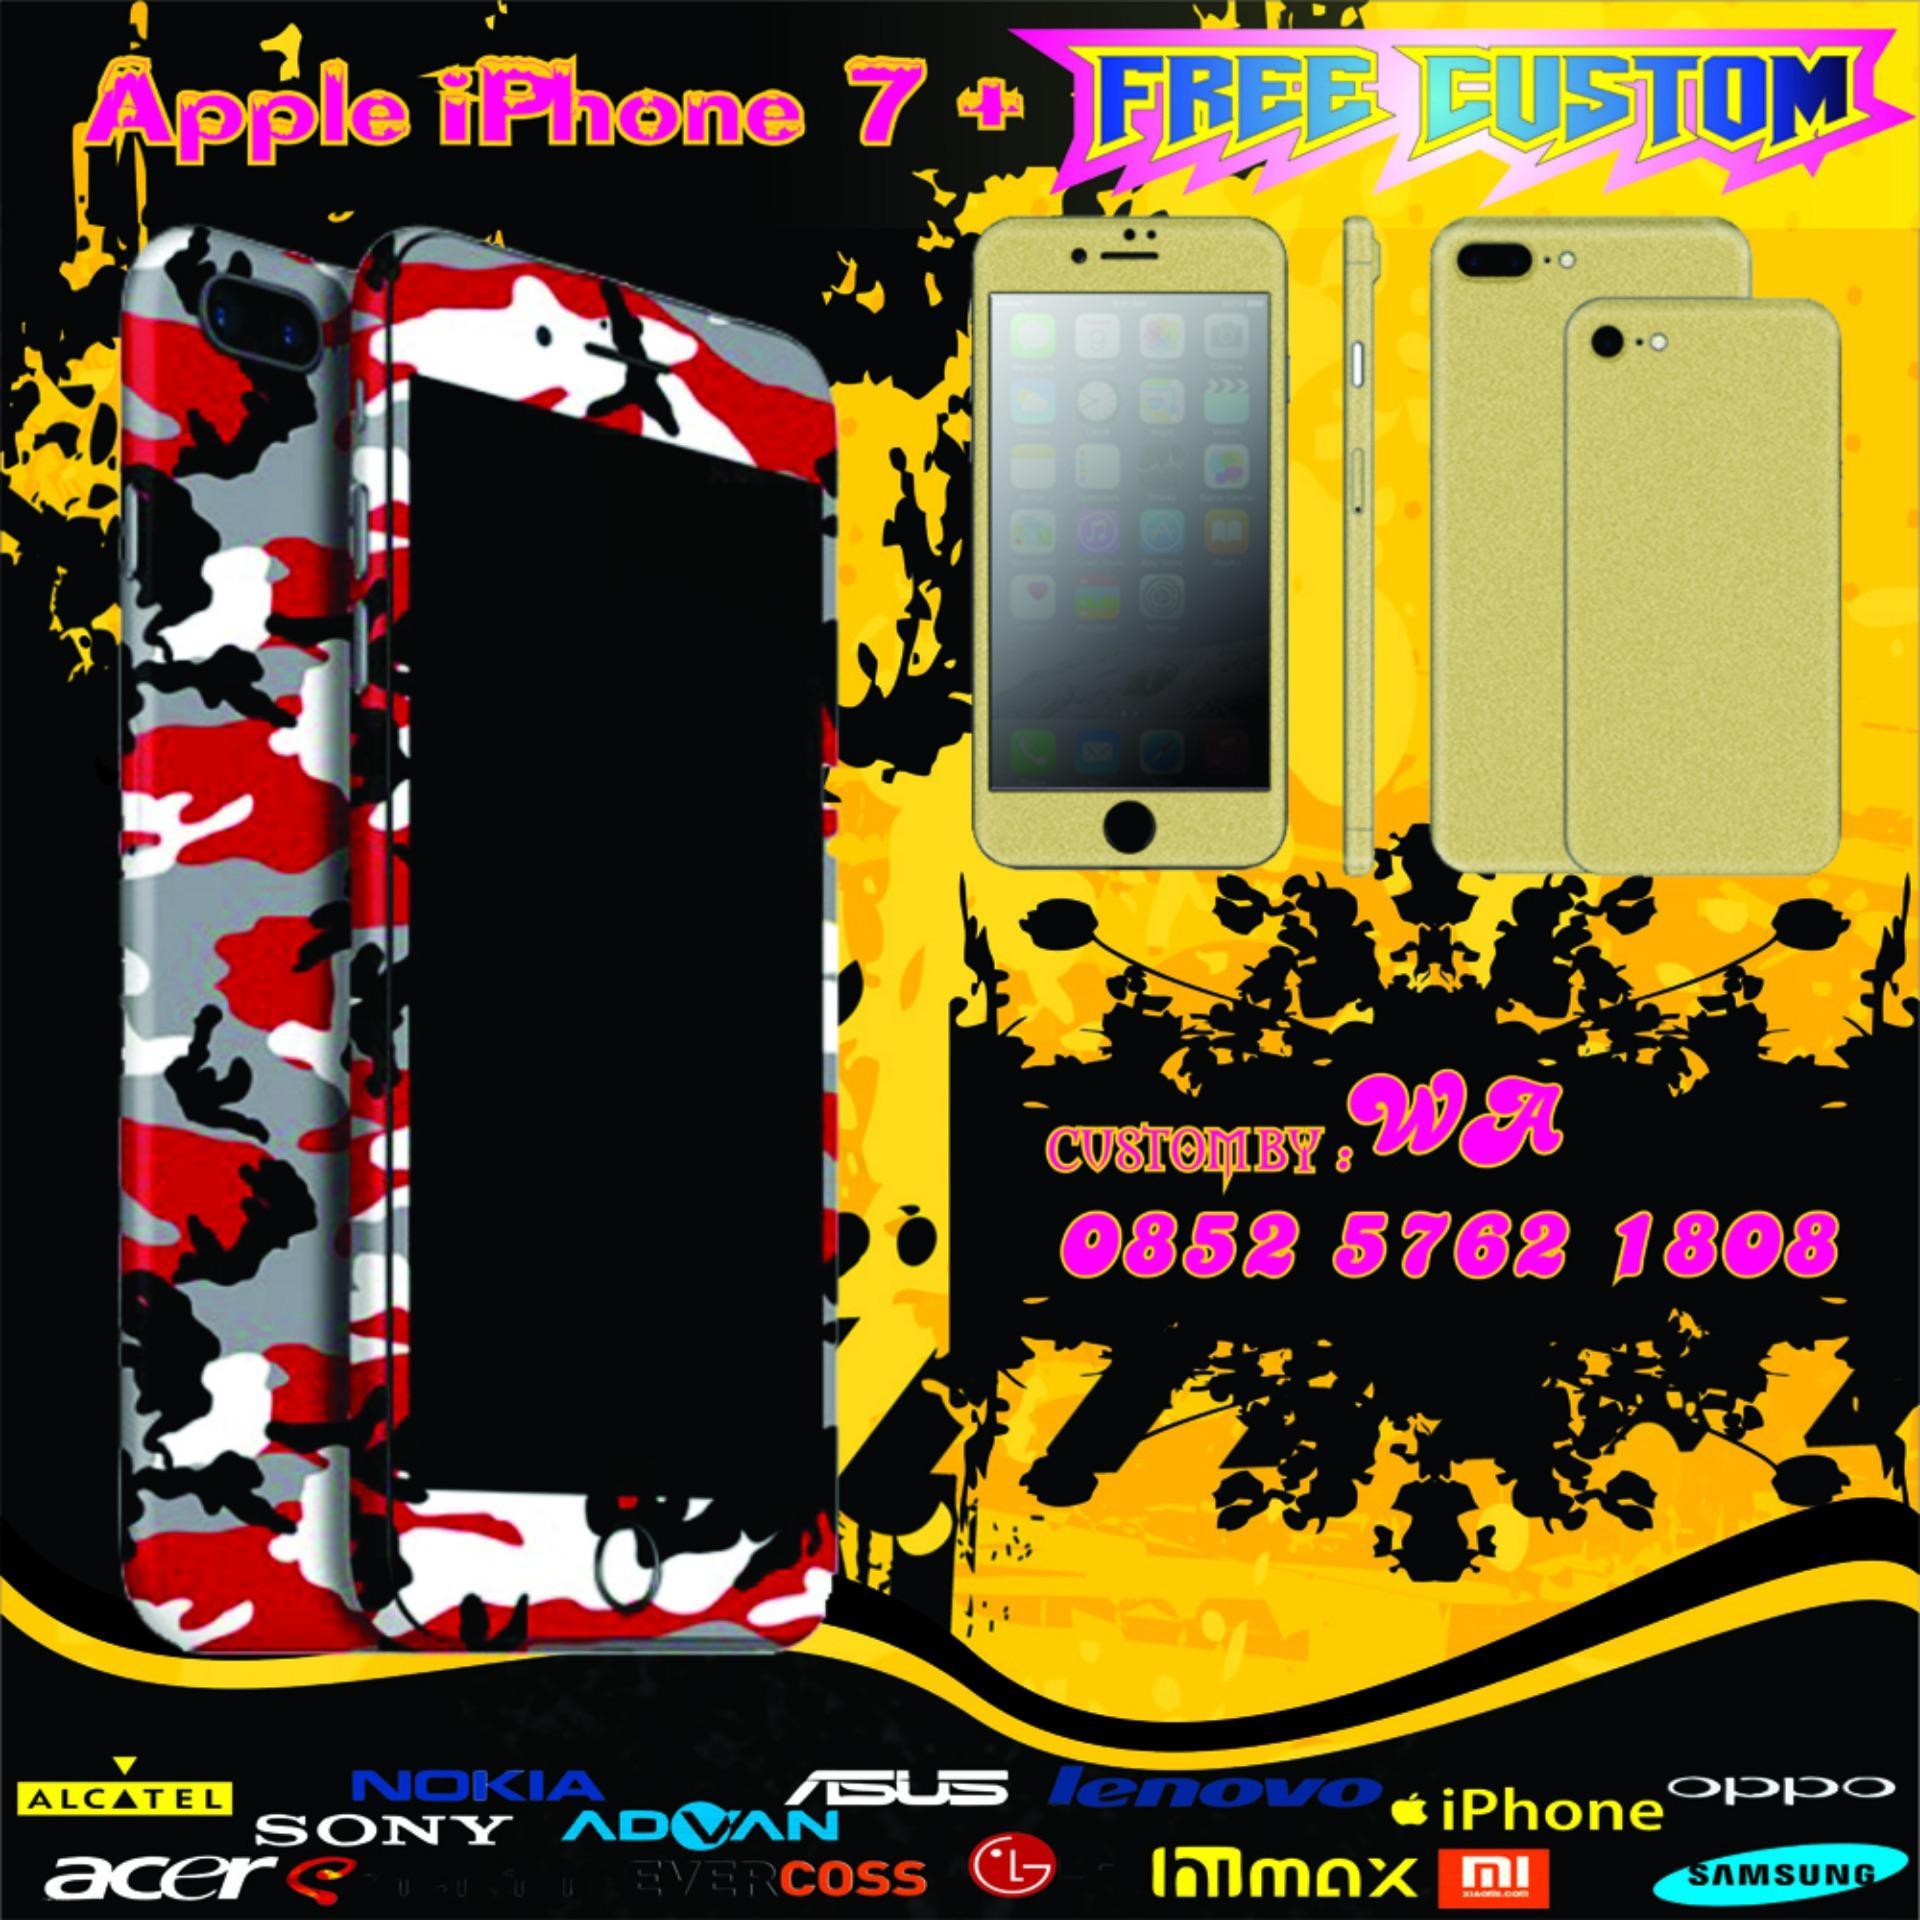 Garskin Vapor Smoant Charon 218w Tc Batman Daftar Harga Terkini Hp Skin Request Custom Iphone 7 Full Body